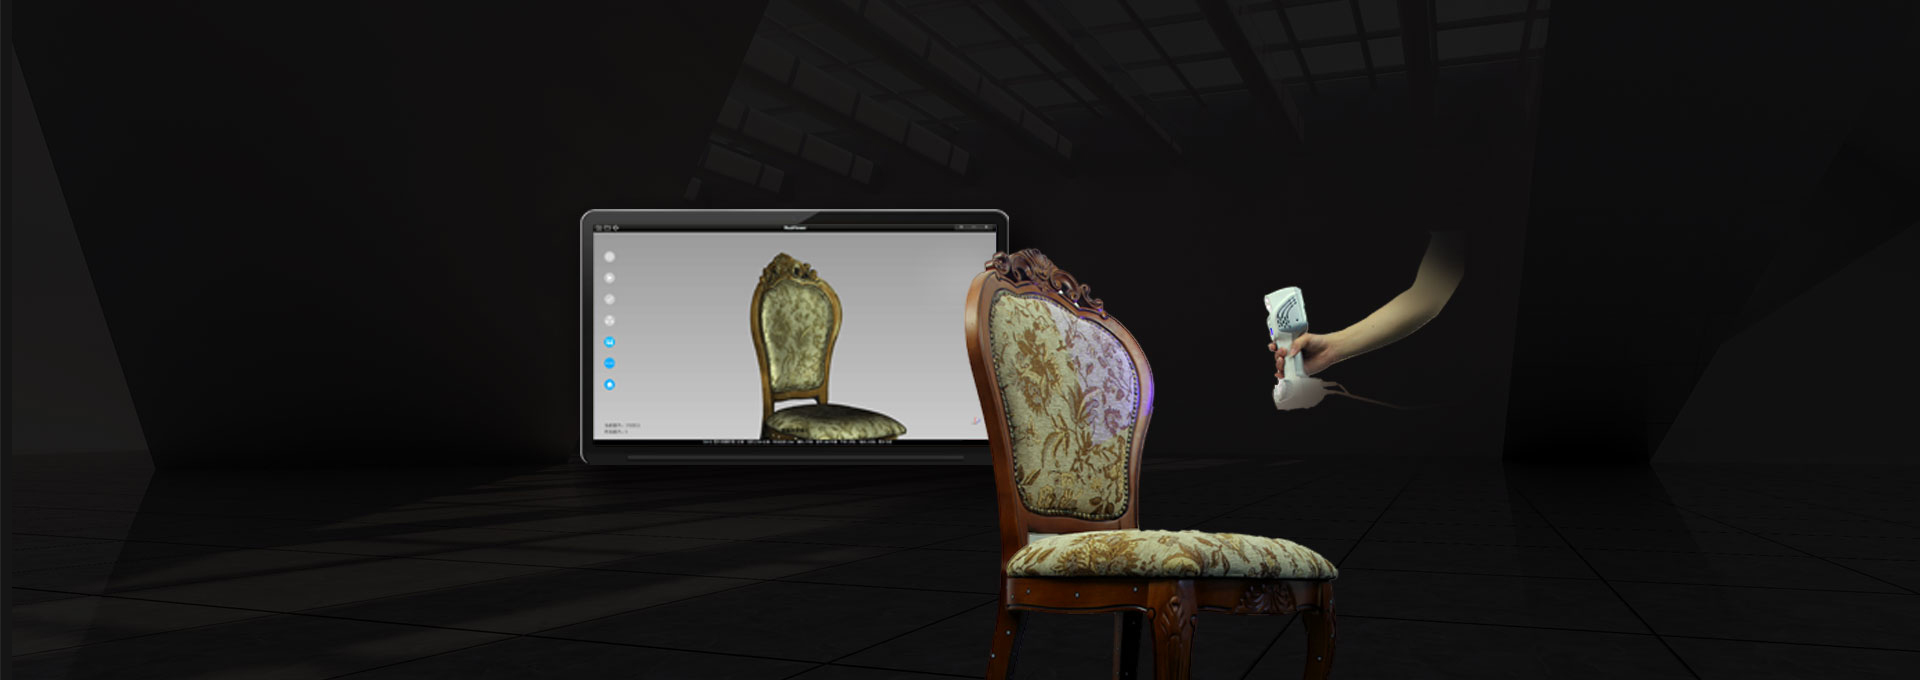 iReal彩色三维扫描仪